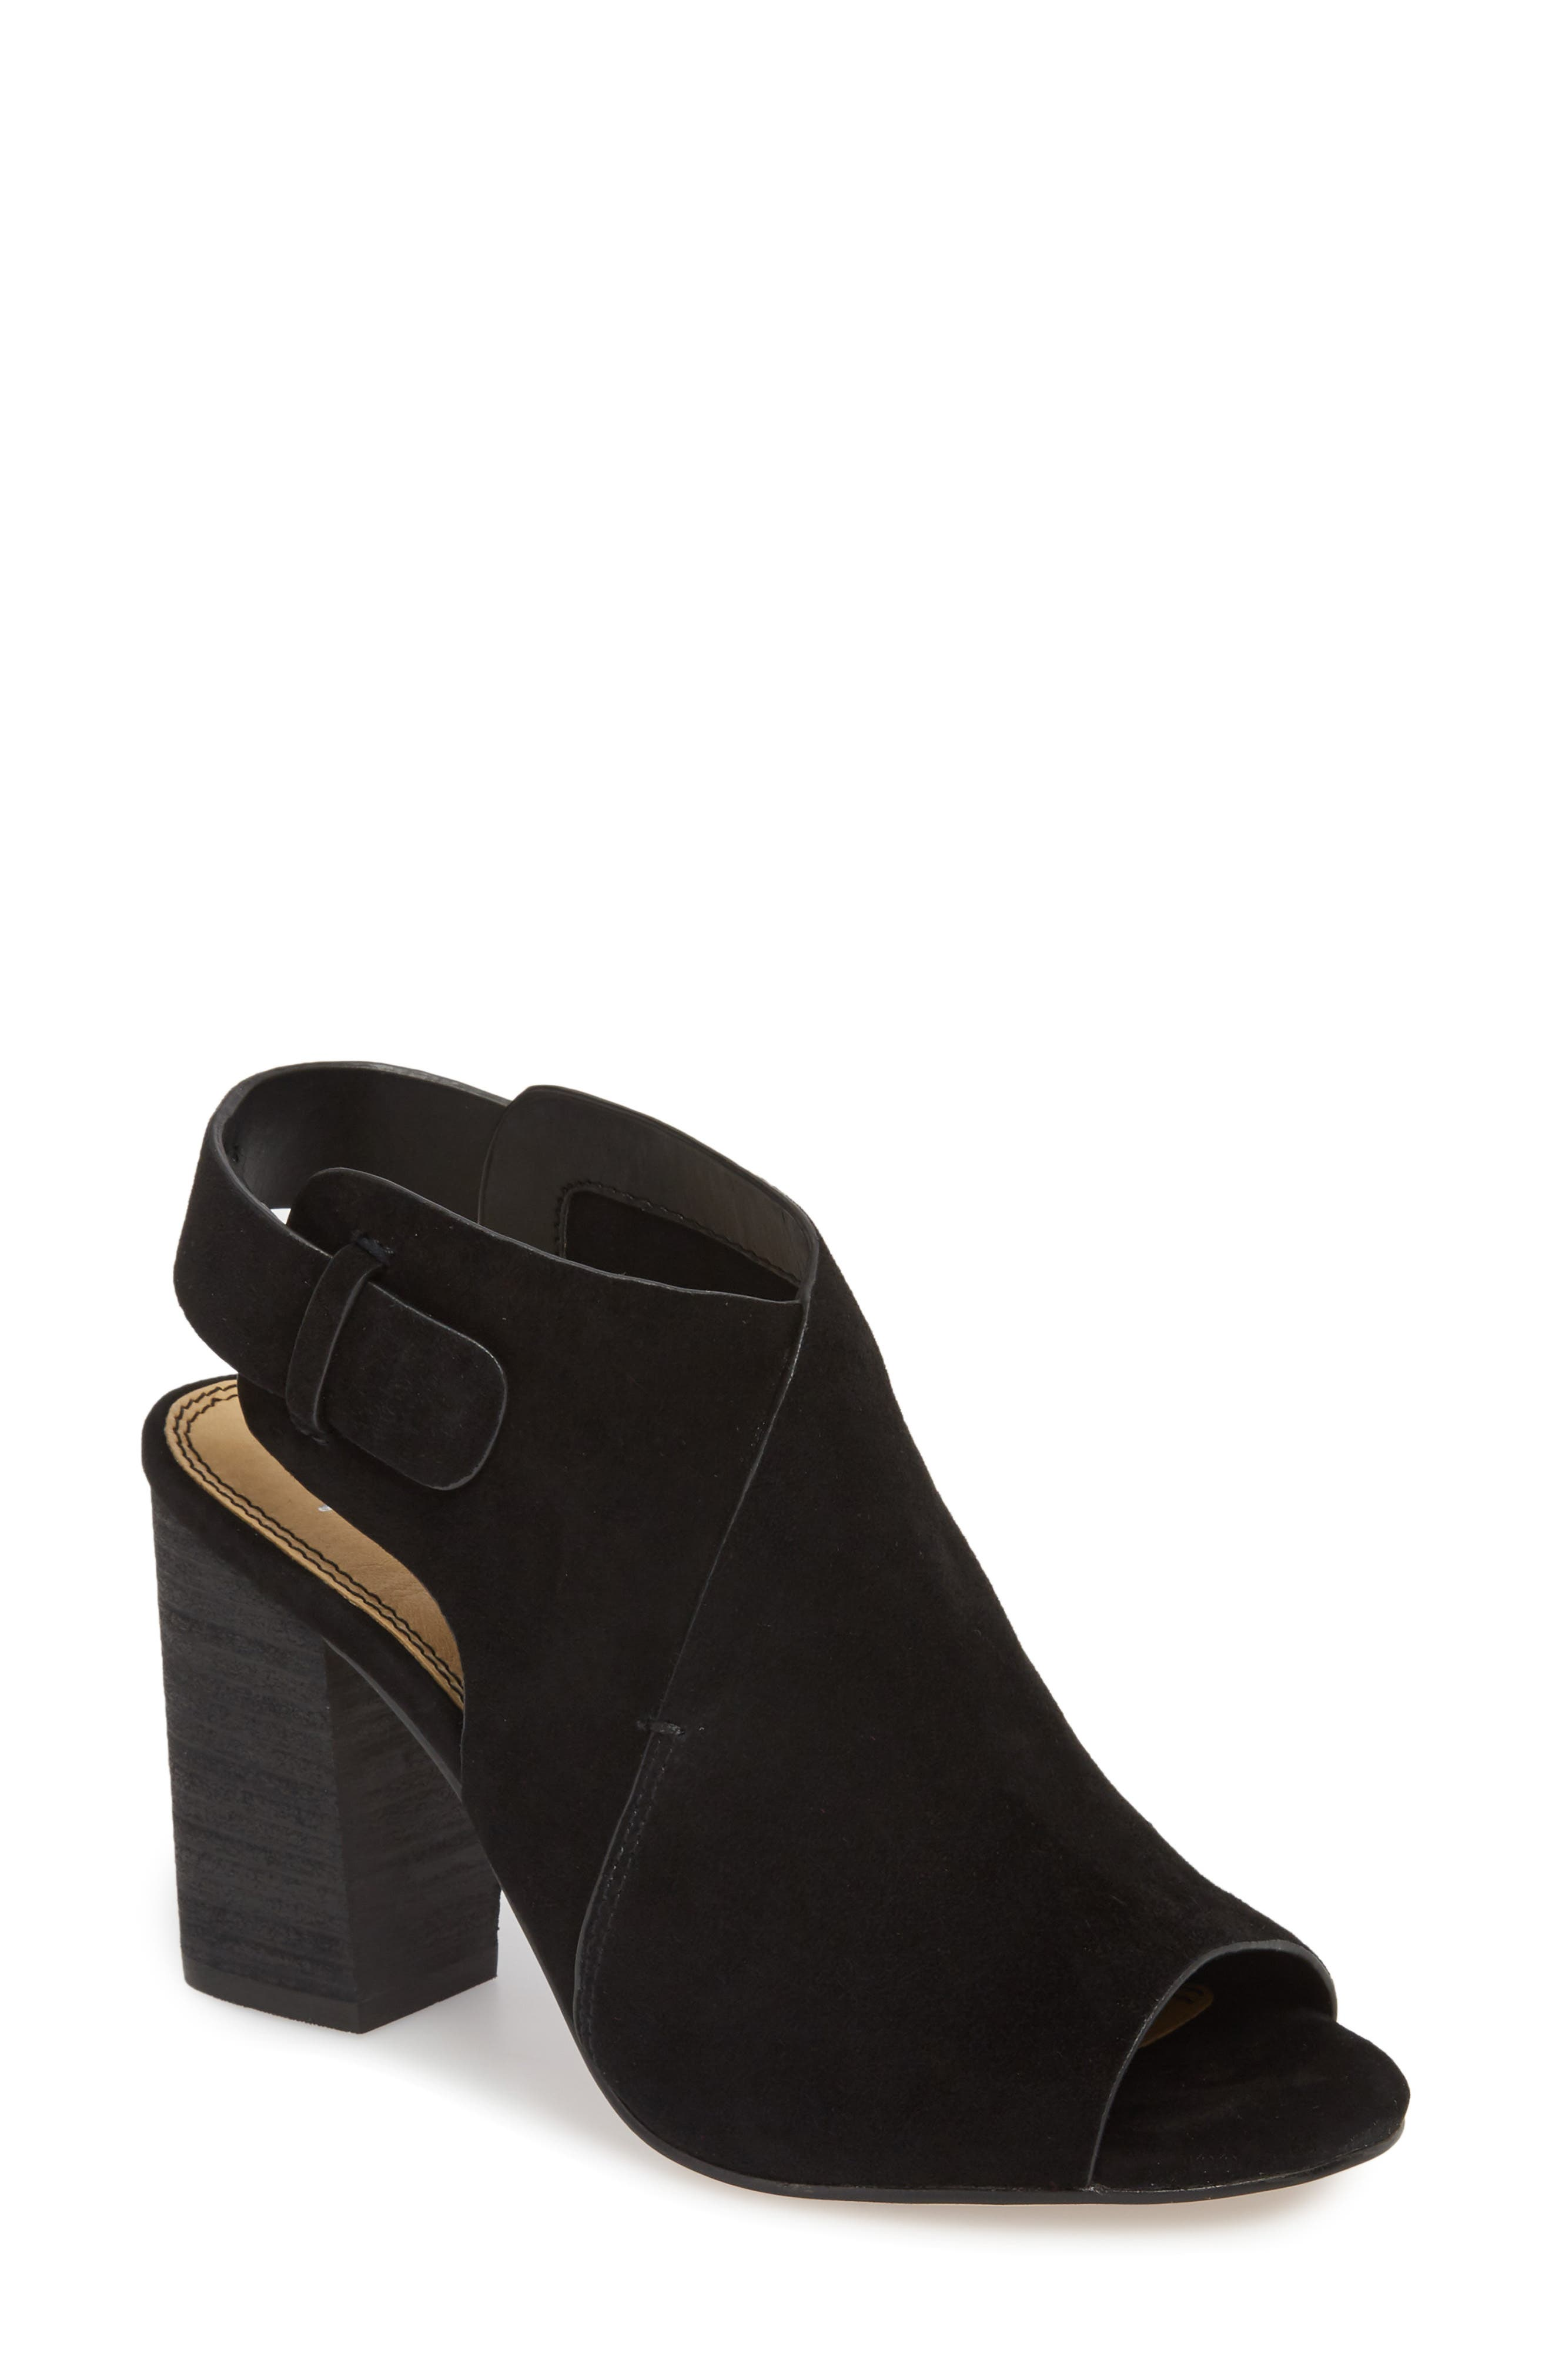 Nikolai Stack Heel Sandal,                         Main,                         color, BLACK SUEDE